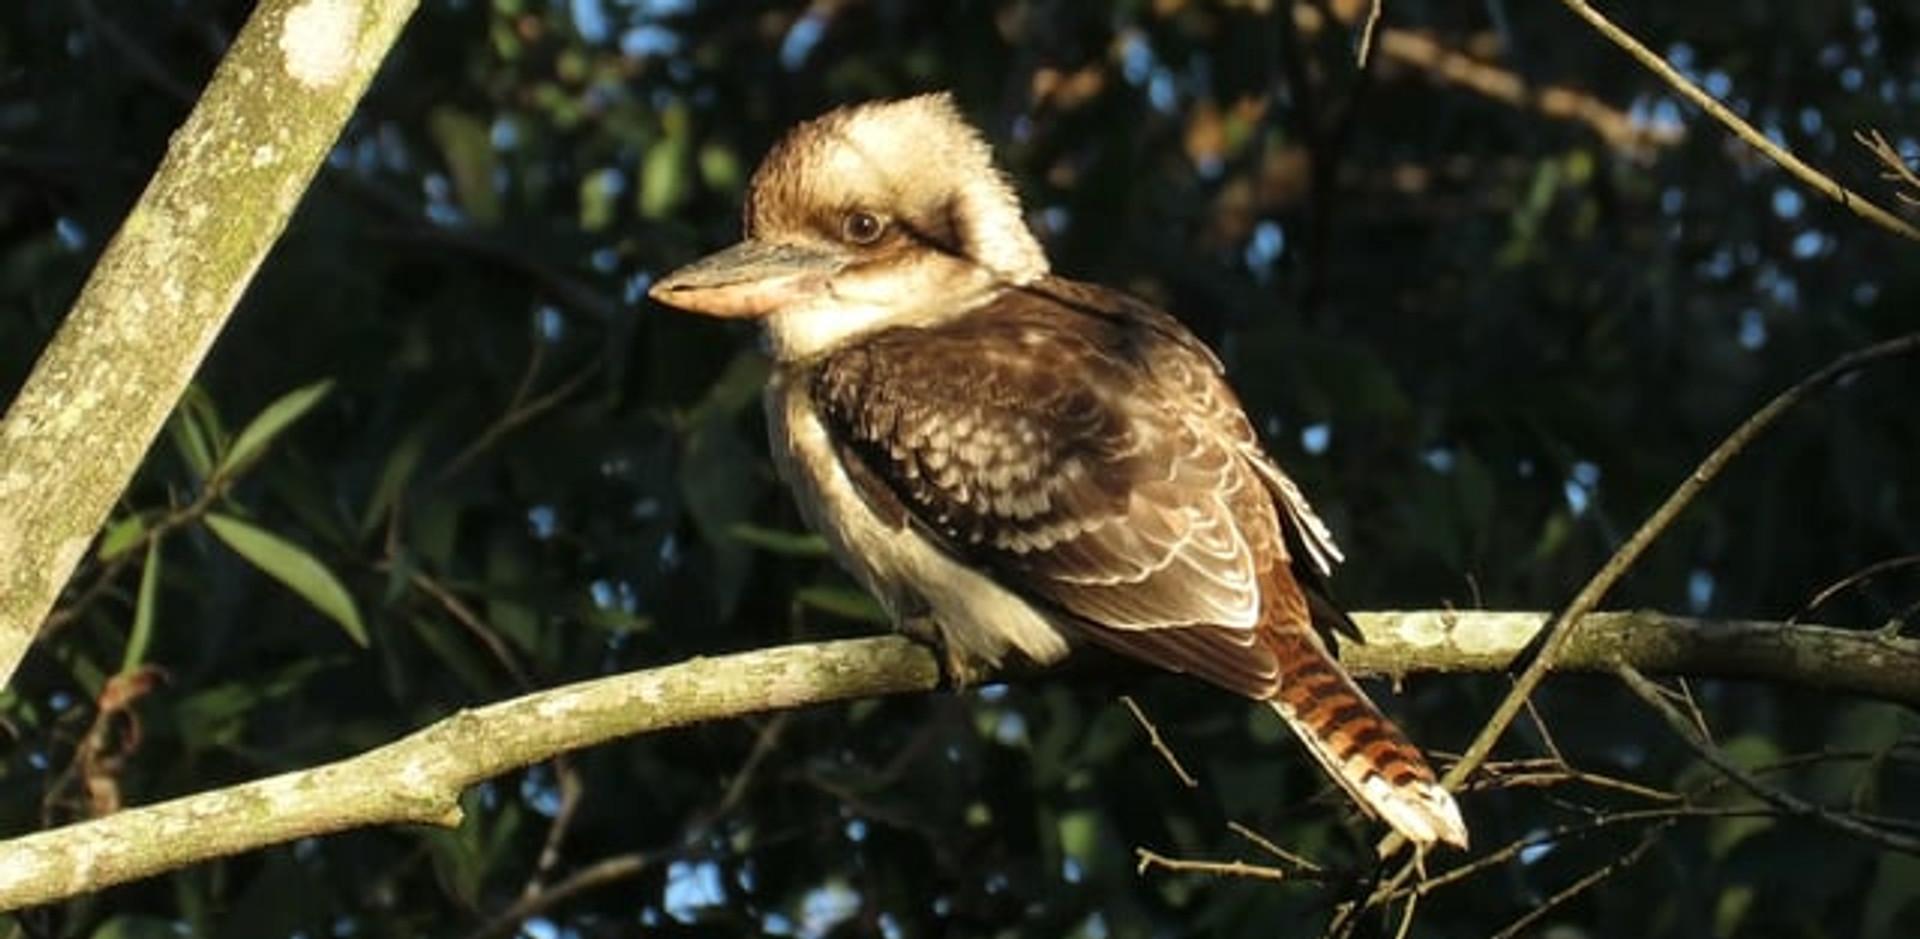 Adult Laughing Kookaburra in the morning sunlight